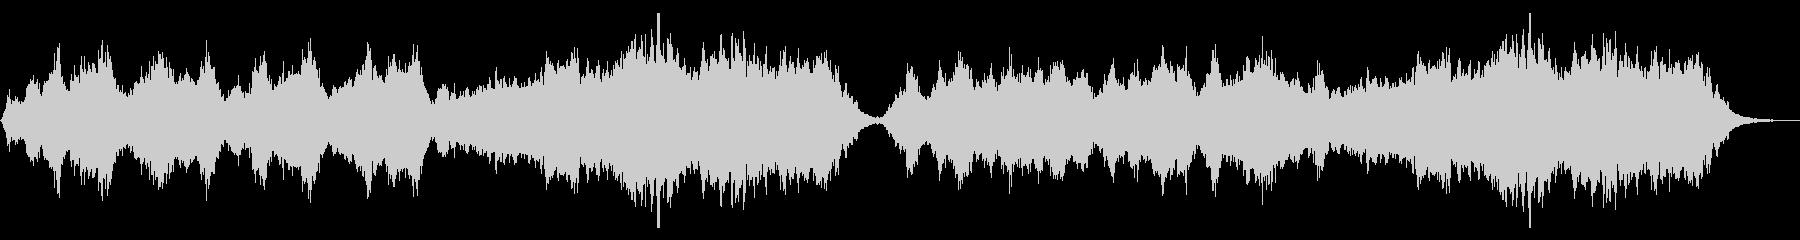 Ambientの未再生の波形